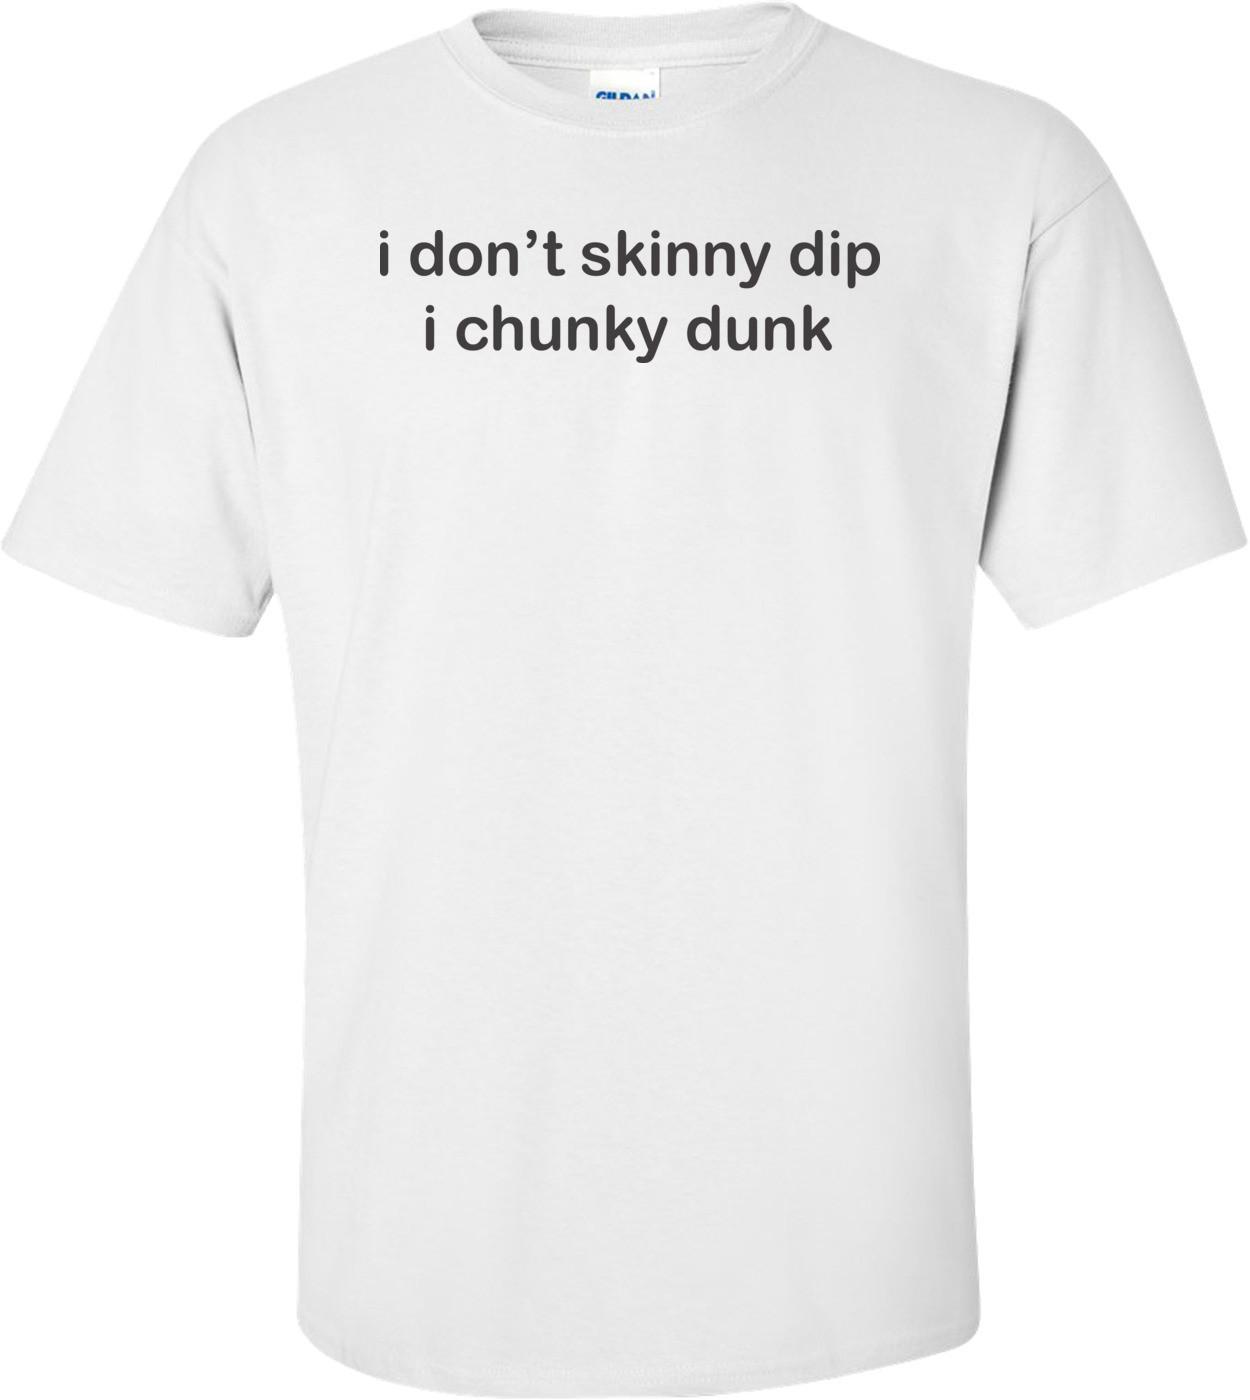 I Don't Skinny Dip I Chunky Dunk T-shirt